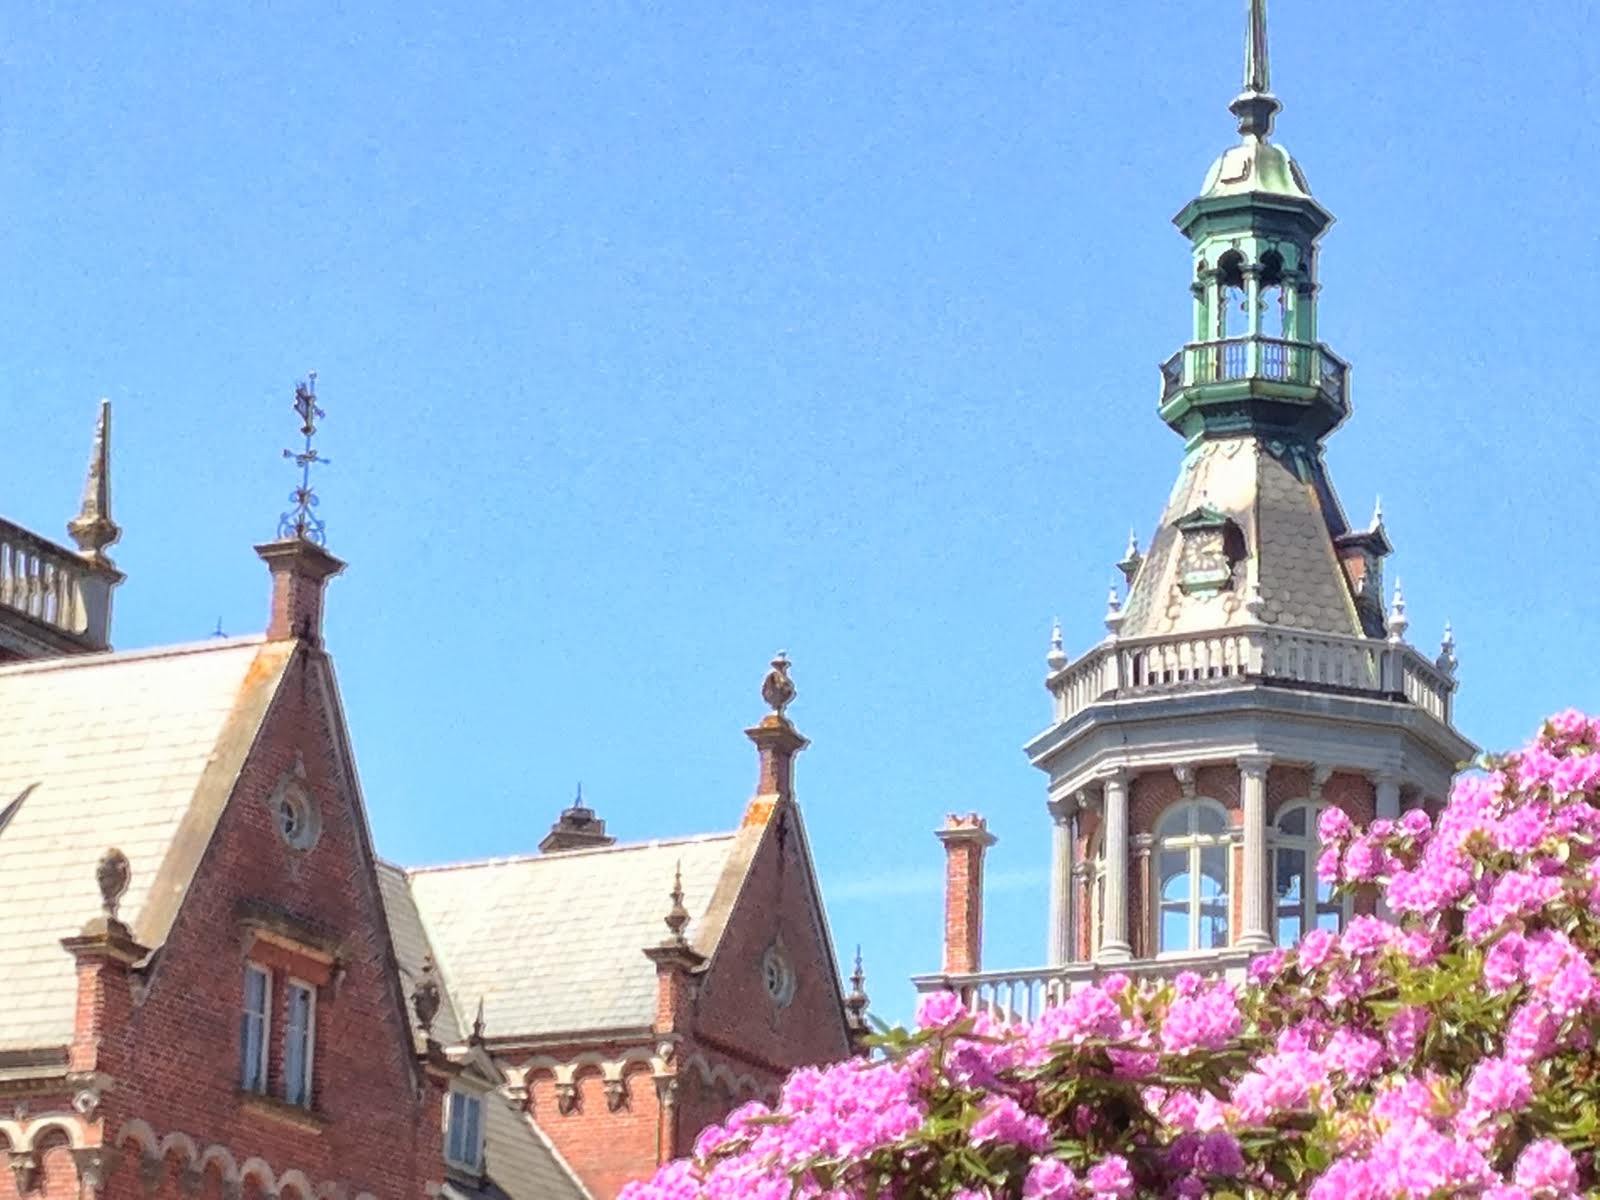 Nya slottet Kulla Gunnarstorp